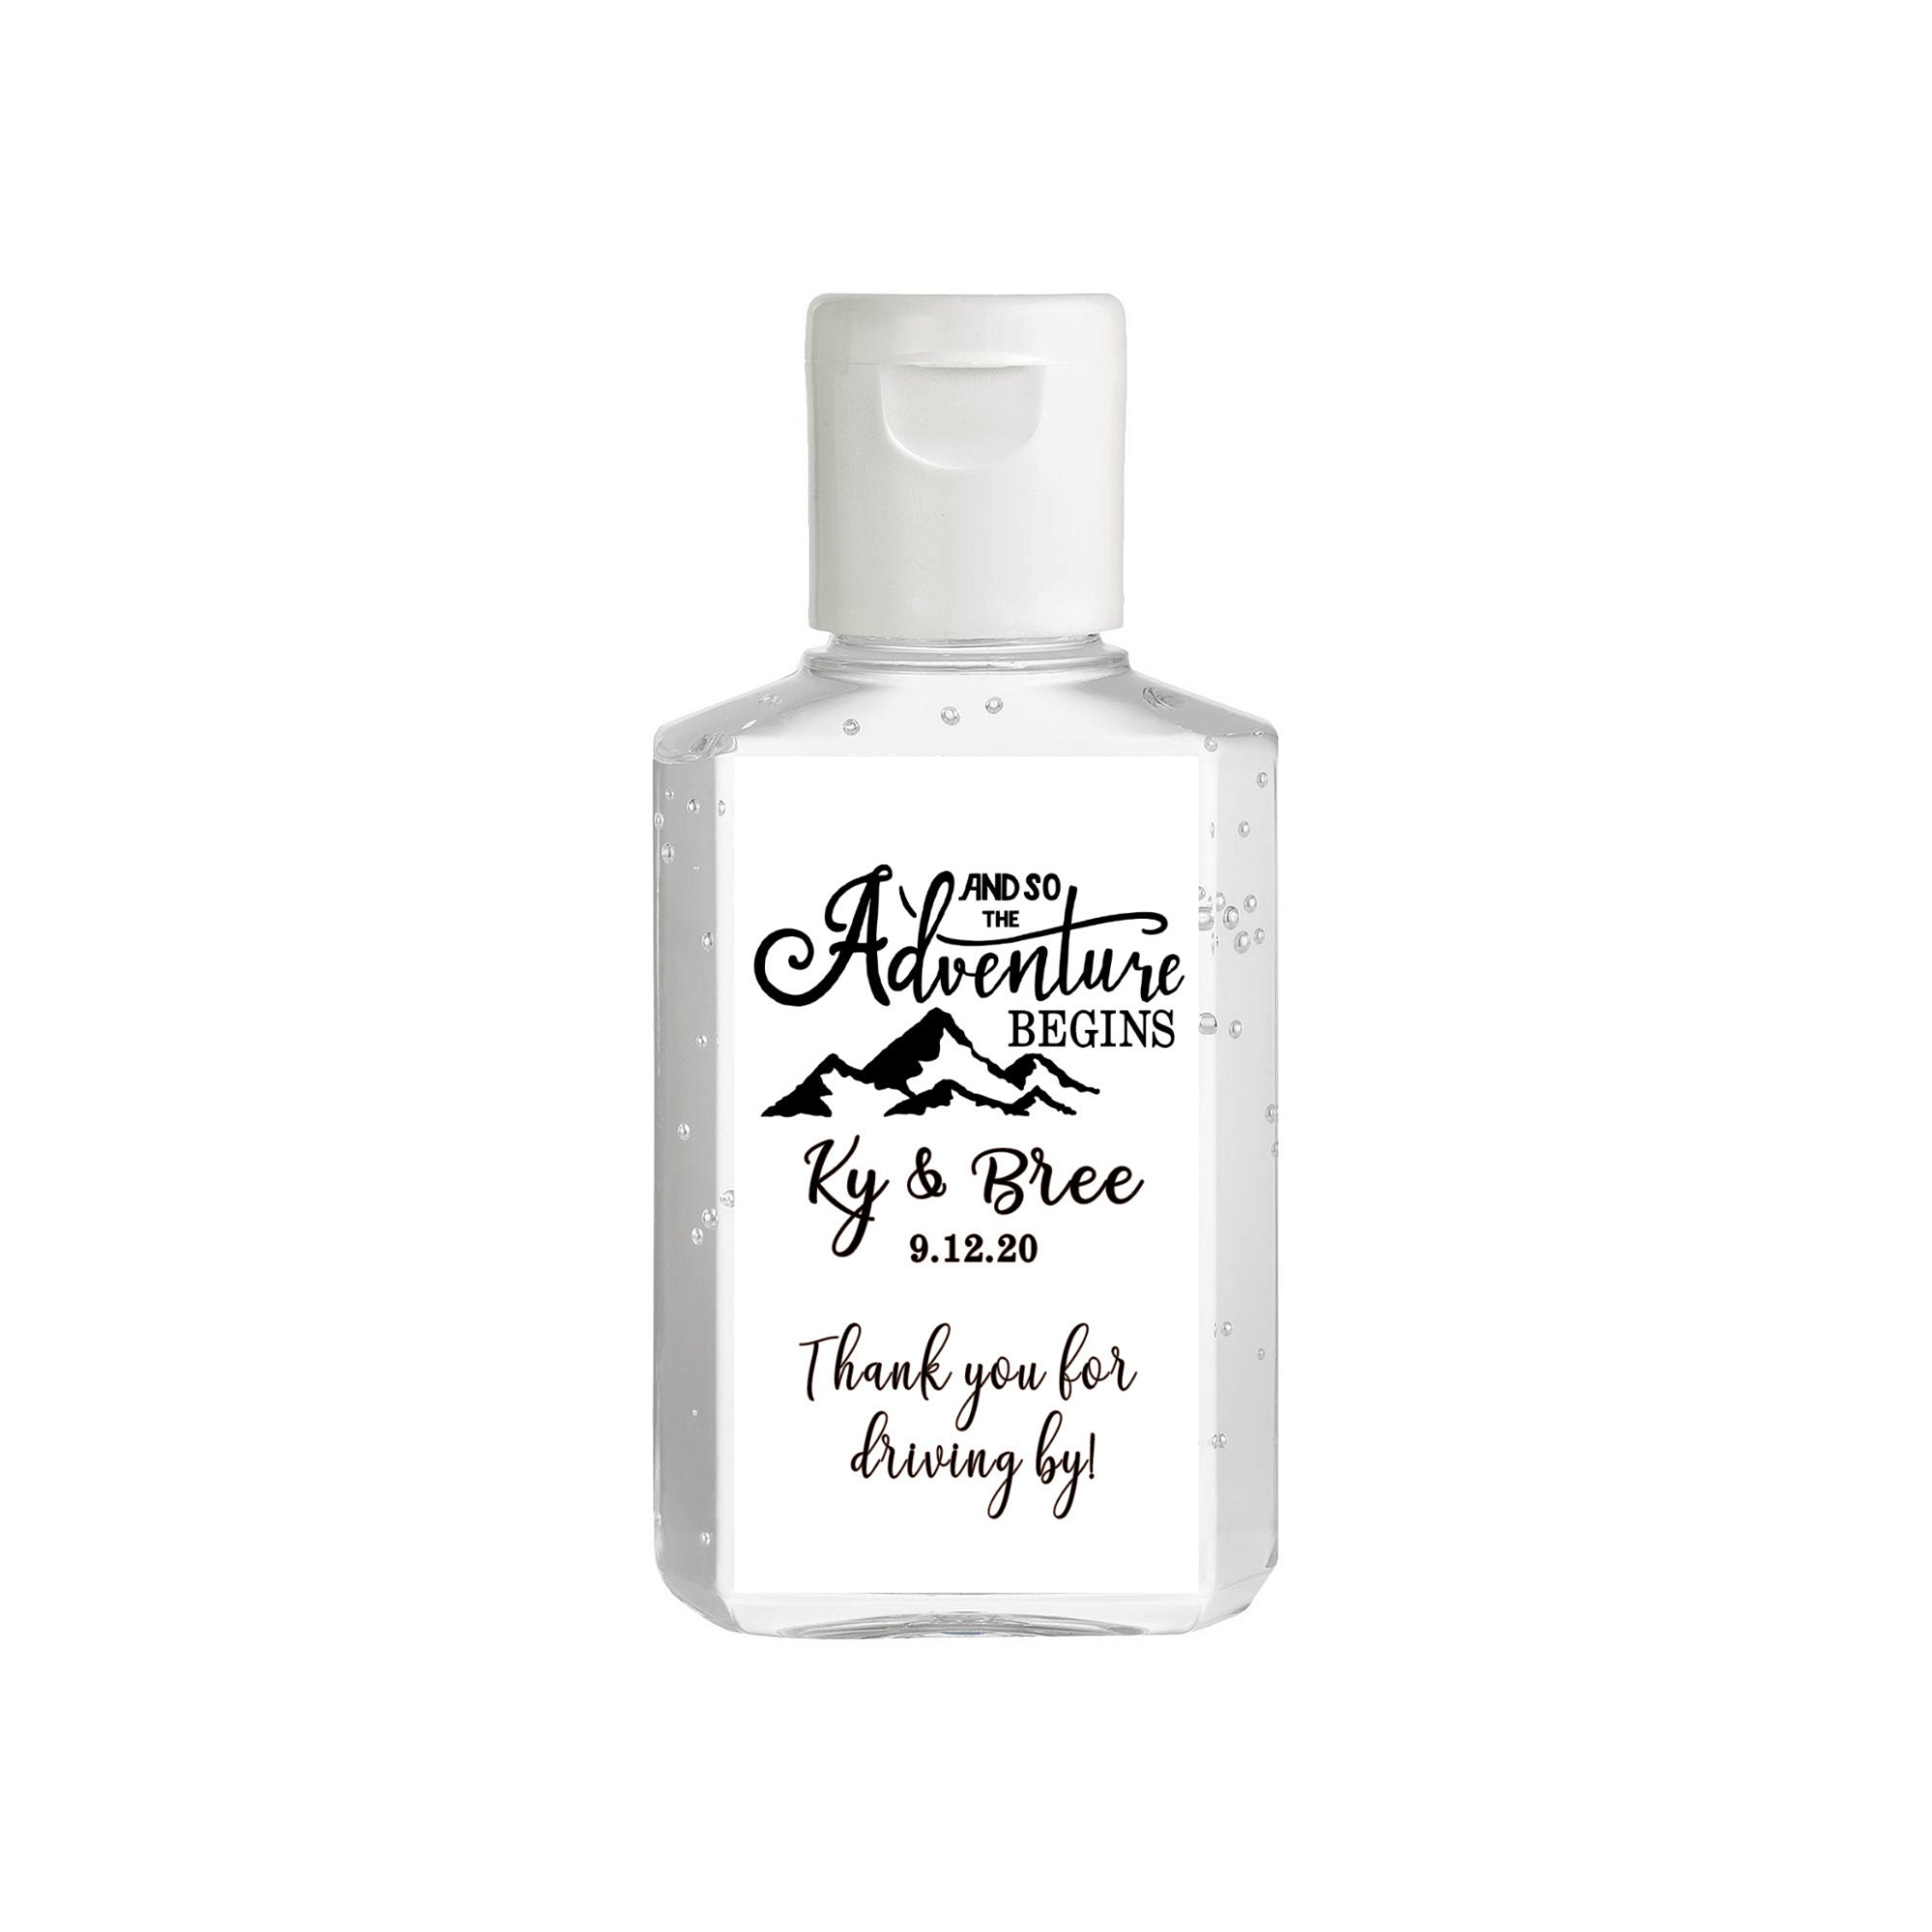 Simple Wedding Custom Hand Sanitizer Labels